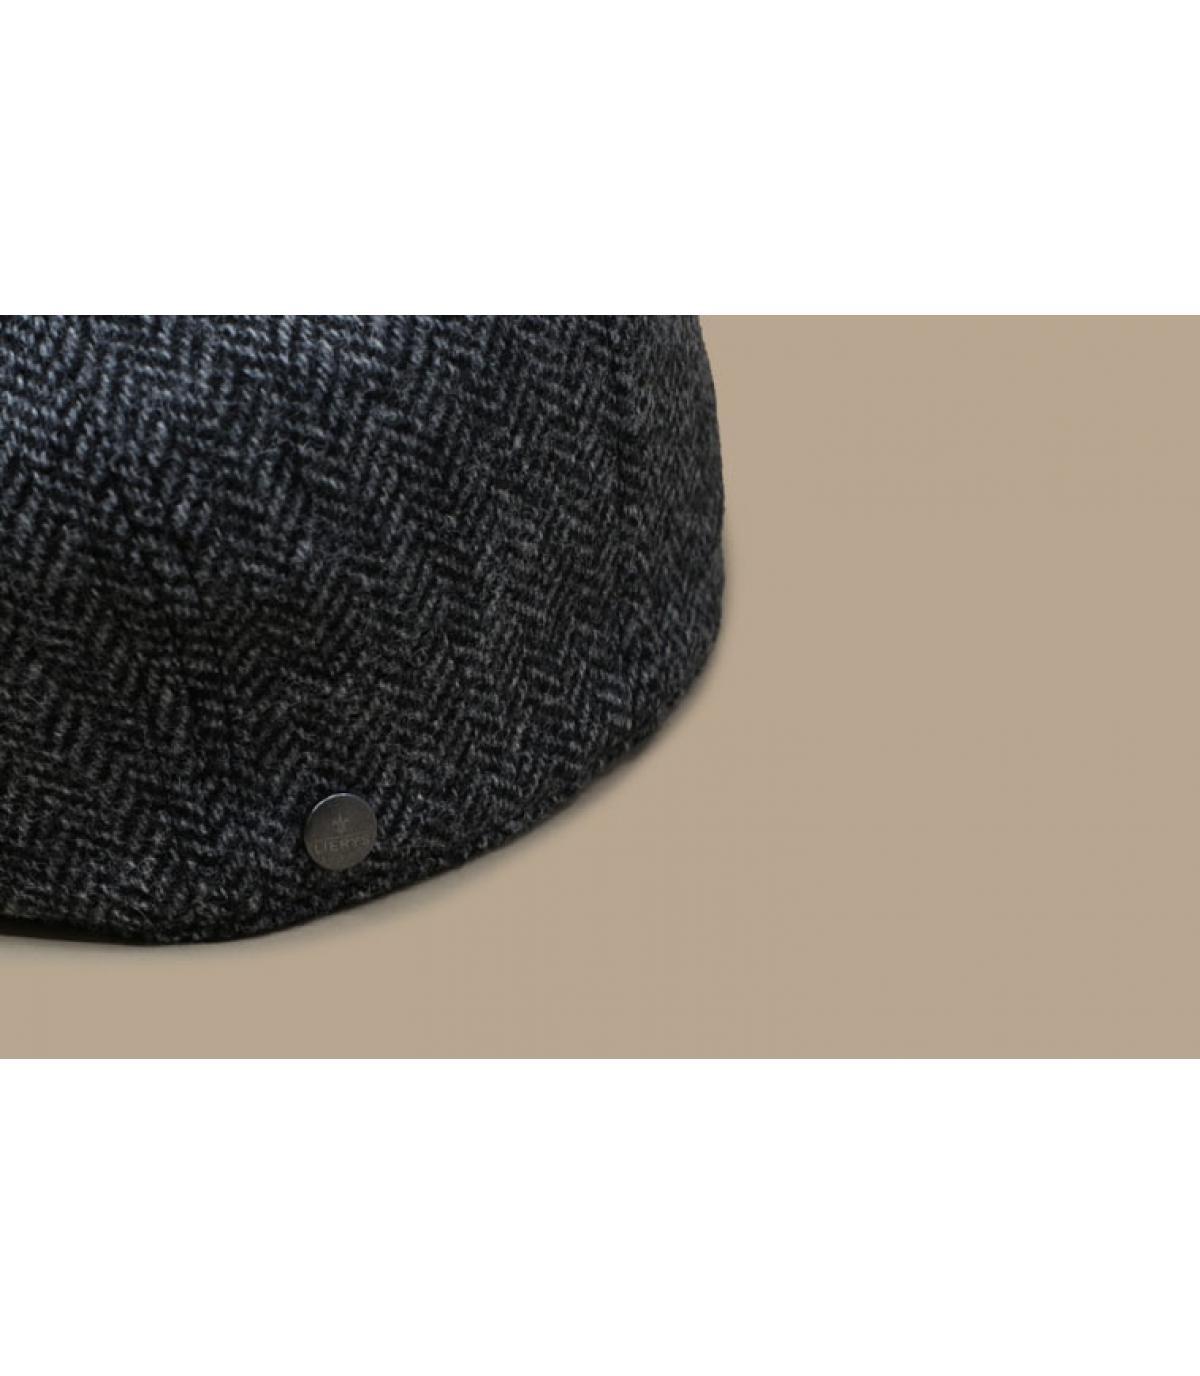 Detalles Britton Wool Herringbone grey imagen 3